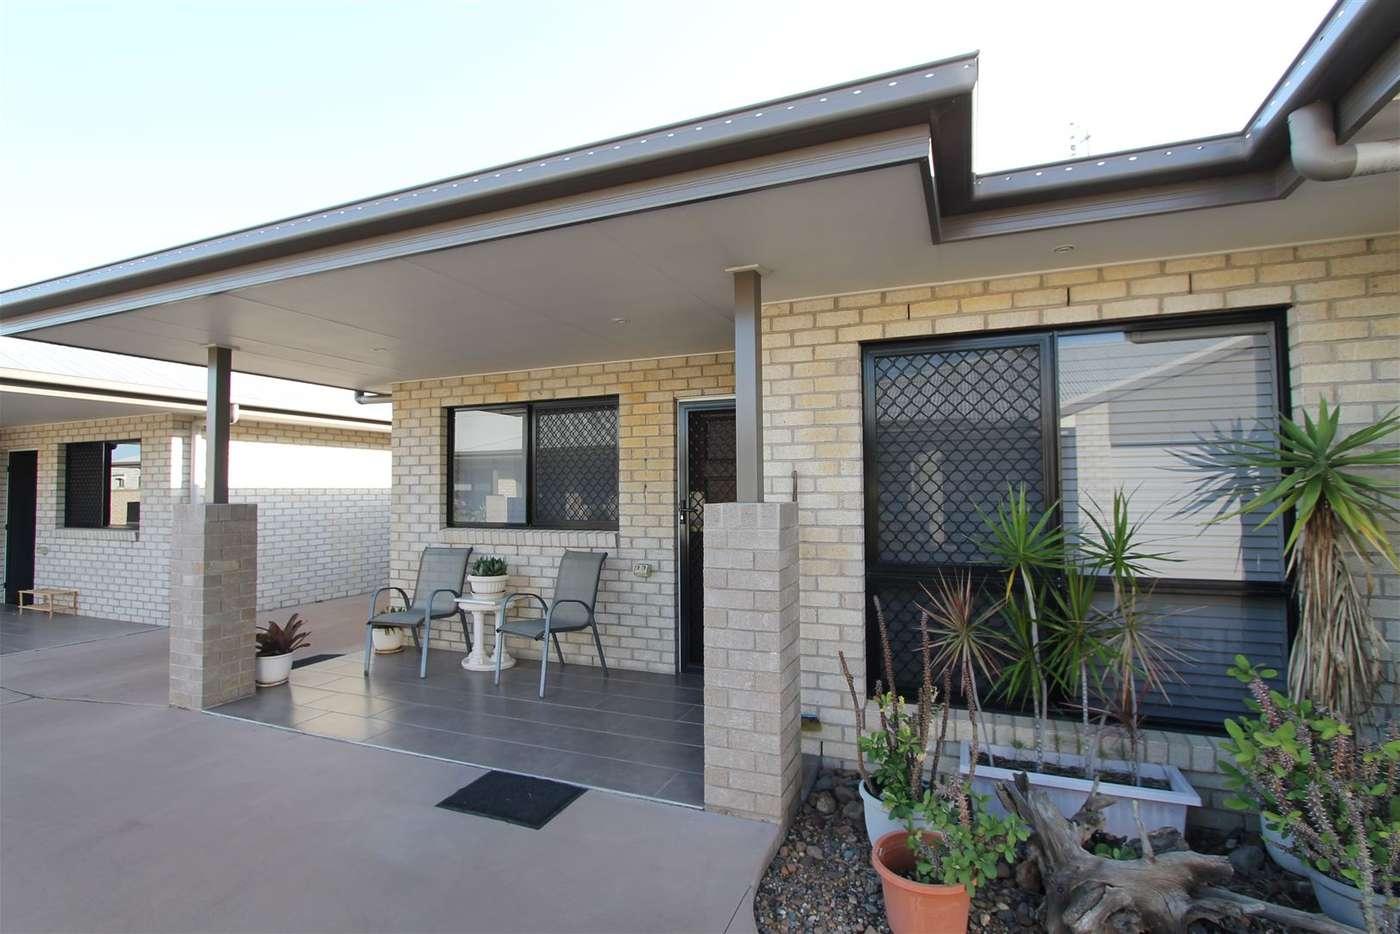 Main view of Homely unit listing, 3/49-51 MacMillan Street, Ayr QLD 4807